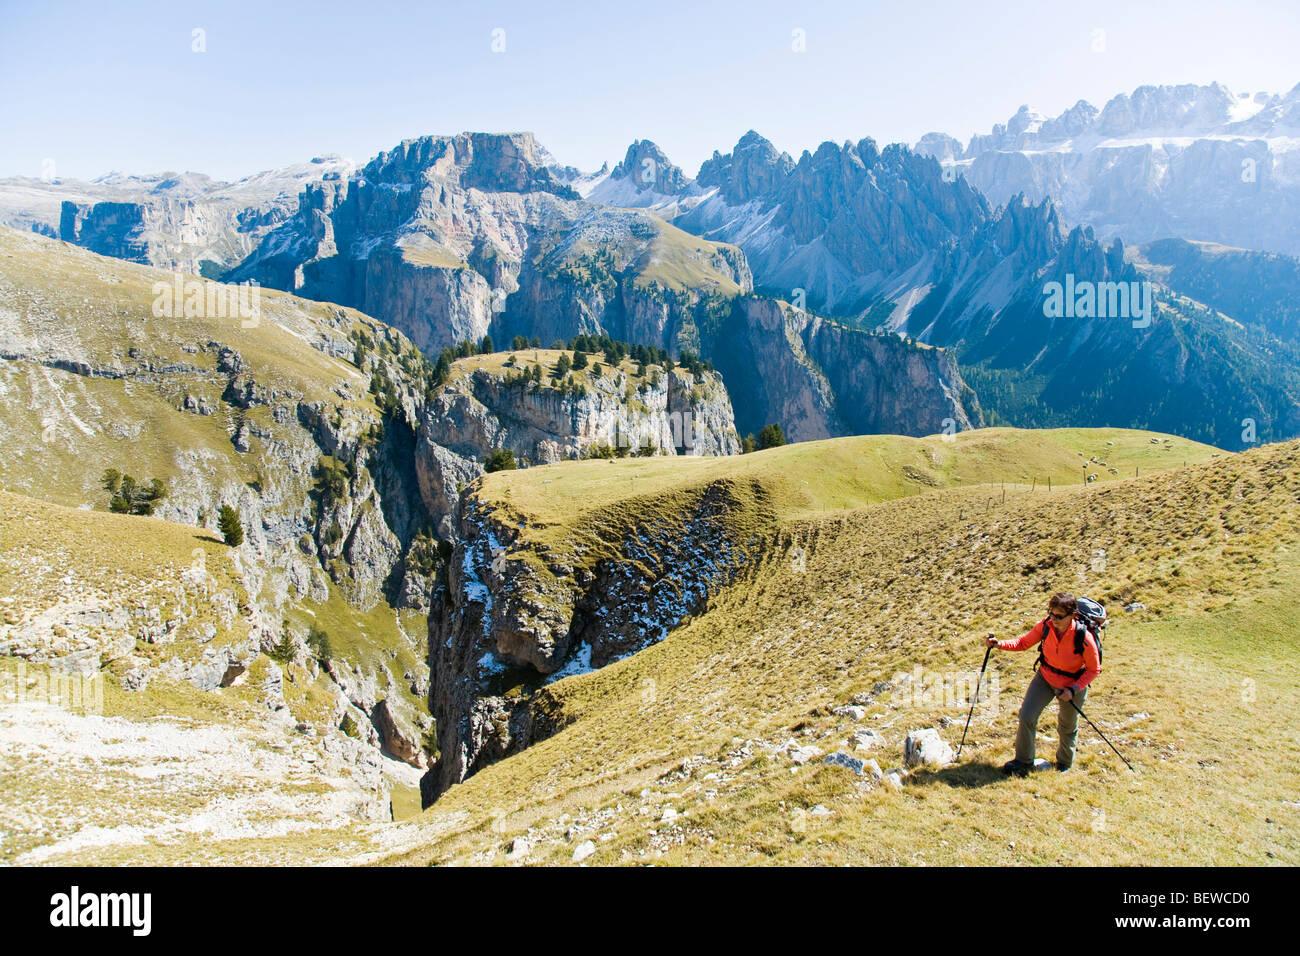 Puez-Geisler, Dolomiti, Italy Stock Photo